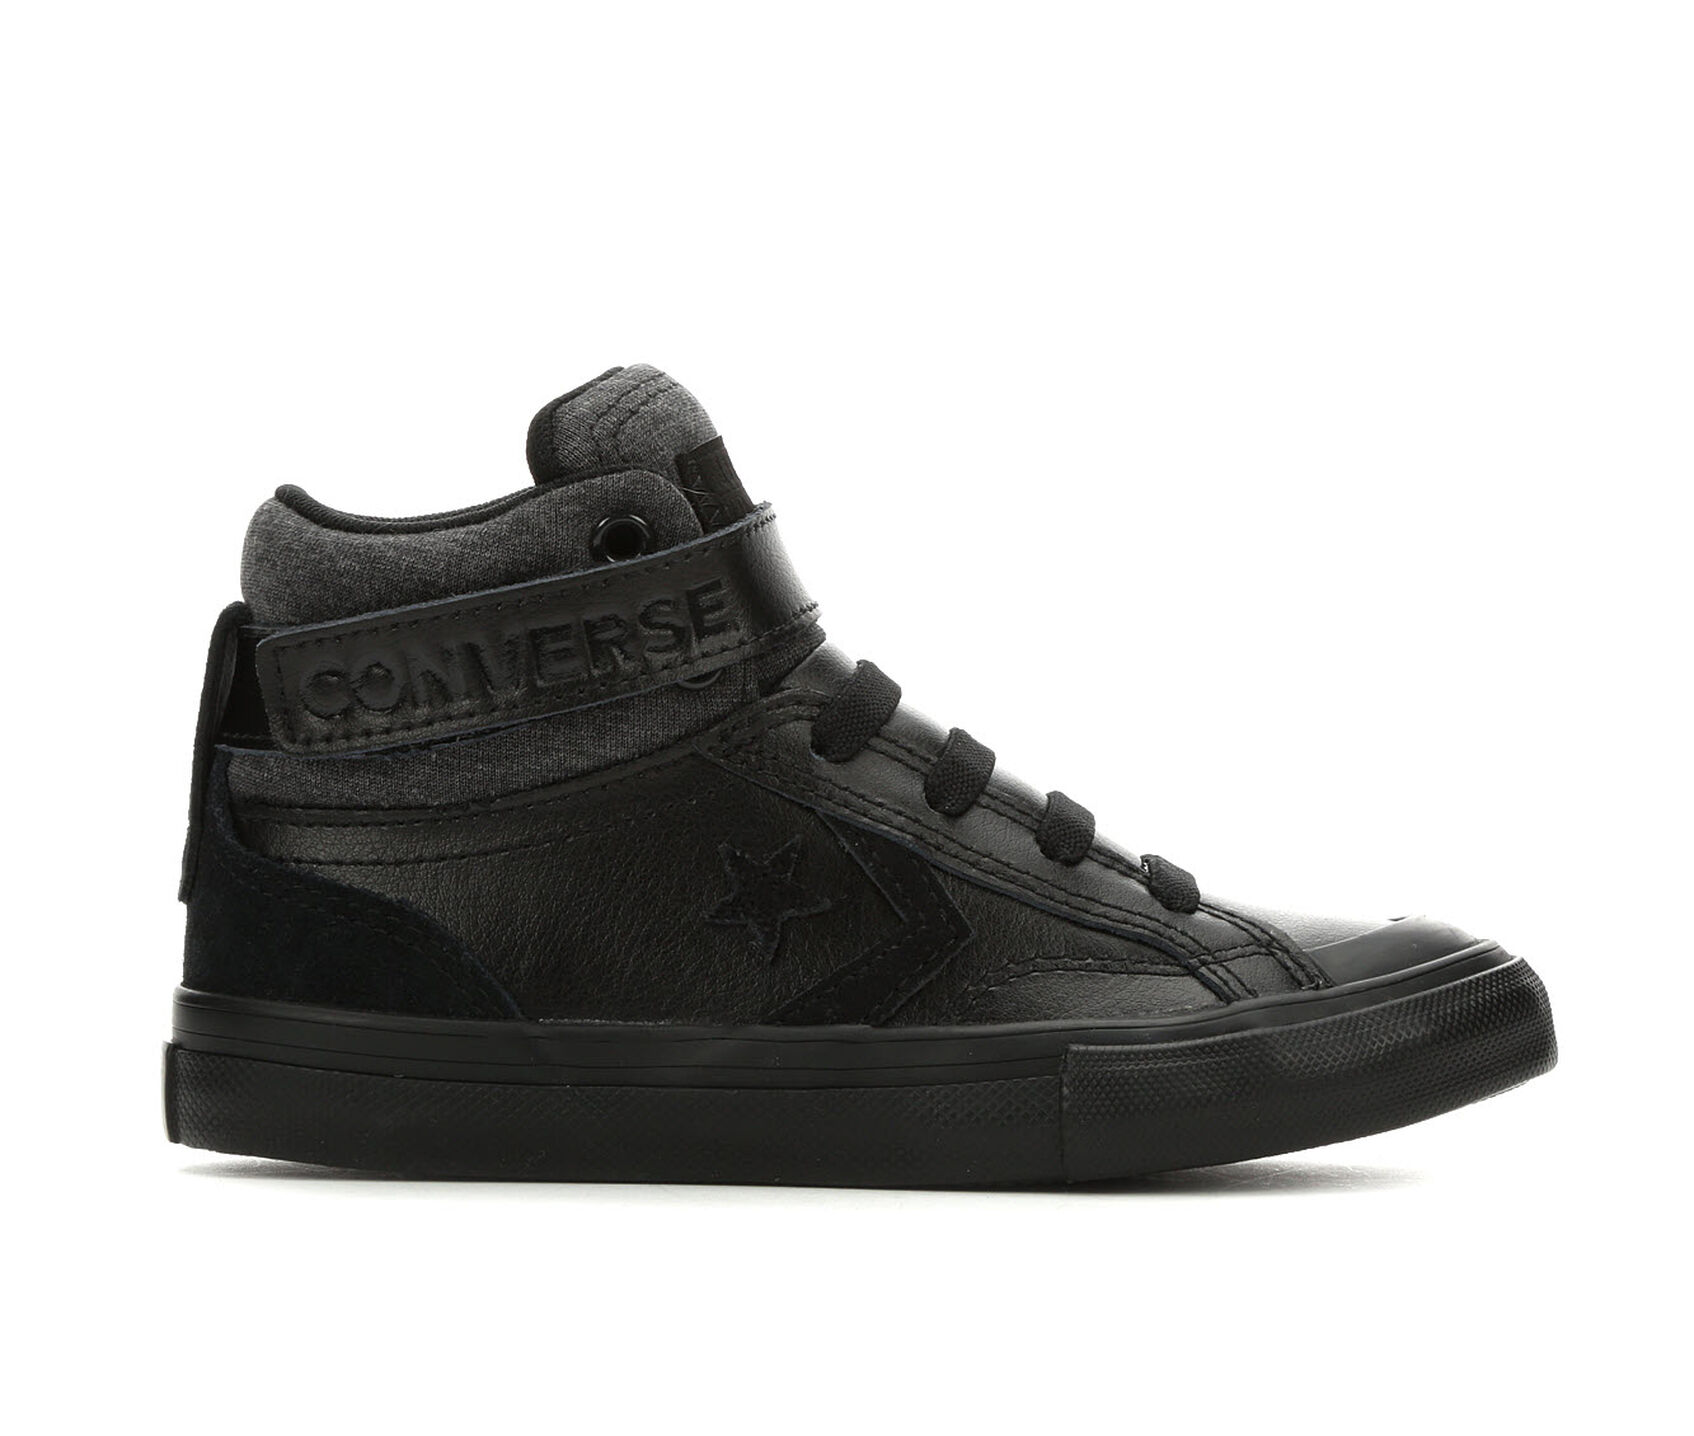 8af146e089ce Kids  Converse Little Kid   Big Kid Pro Blaze Strap Hi Sneakers ...